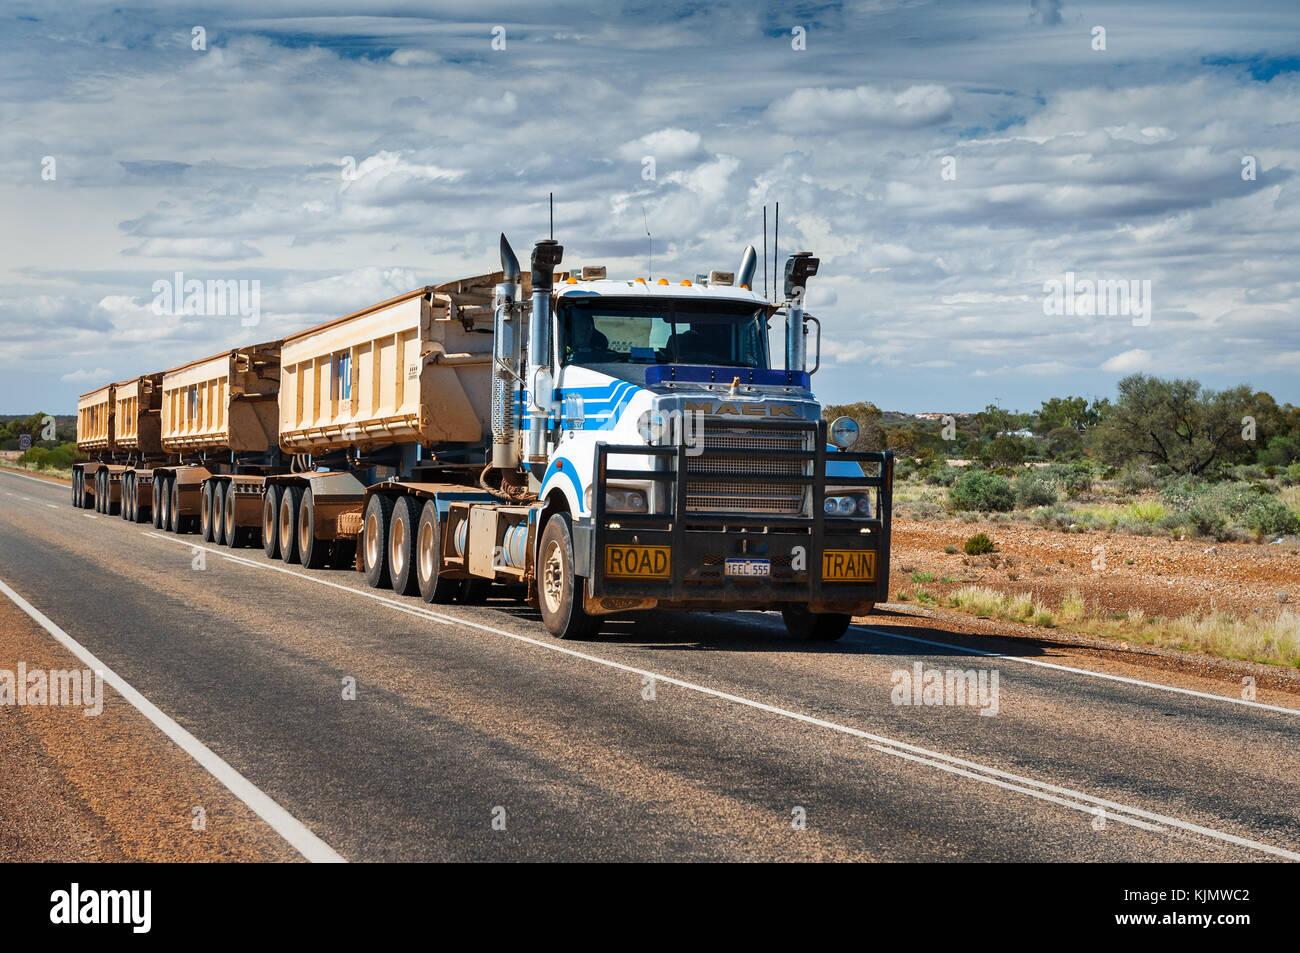 Zug im Outback von Western Australia. Stockbild